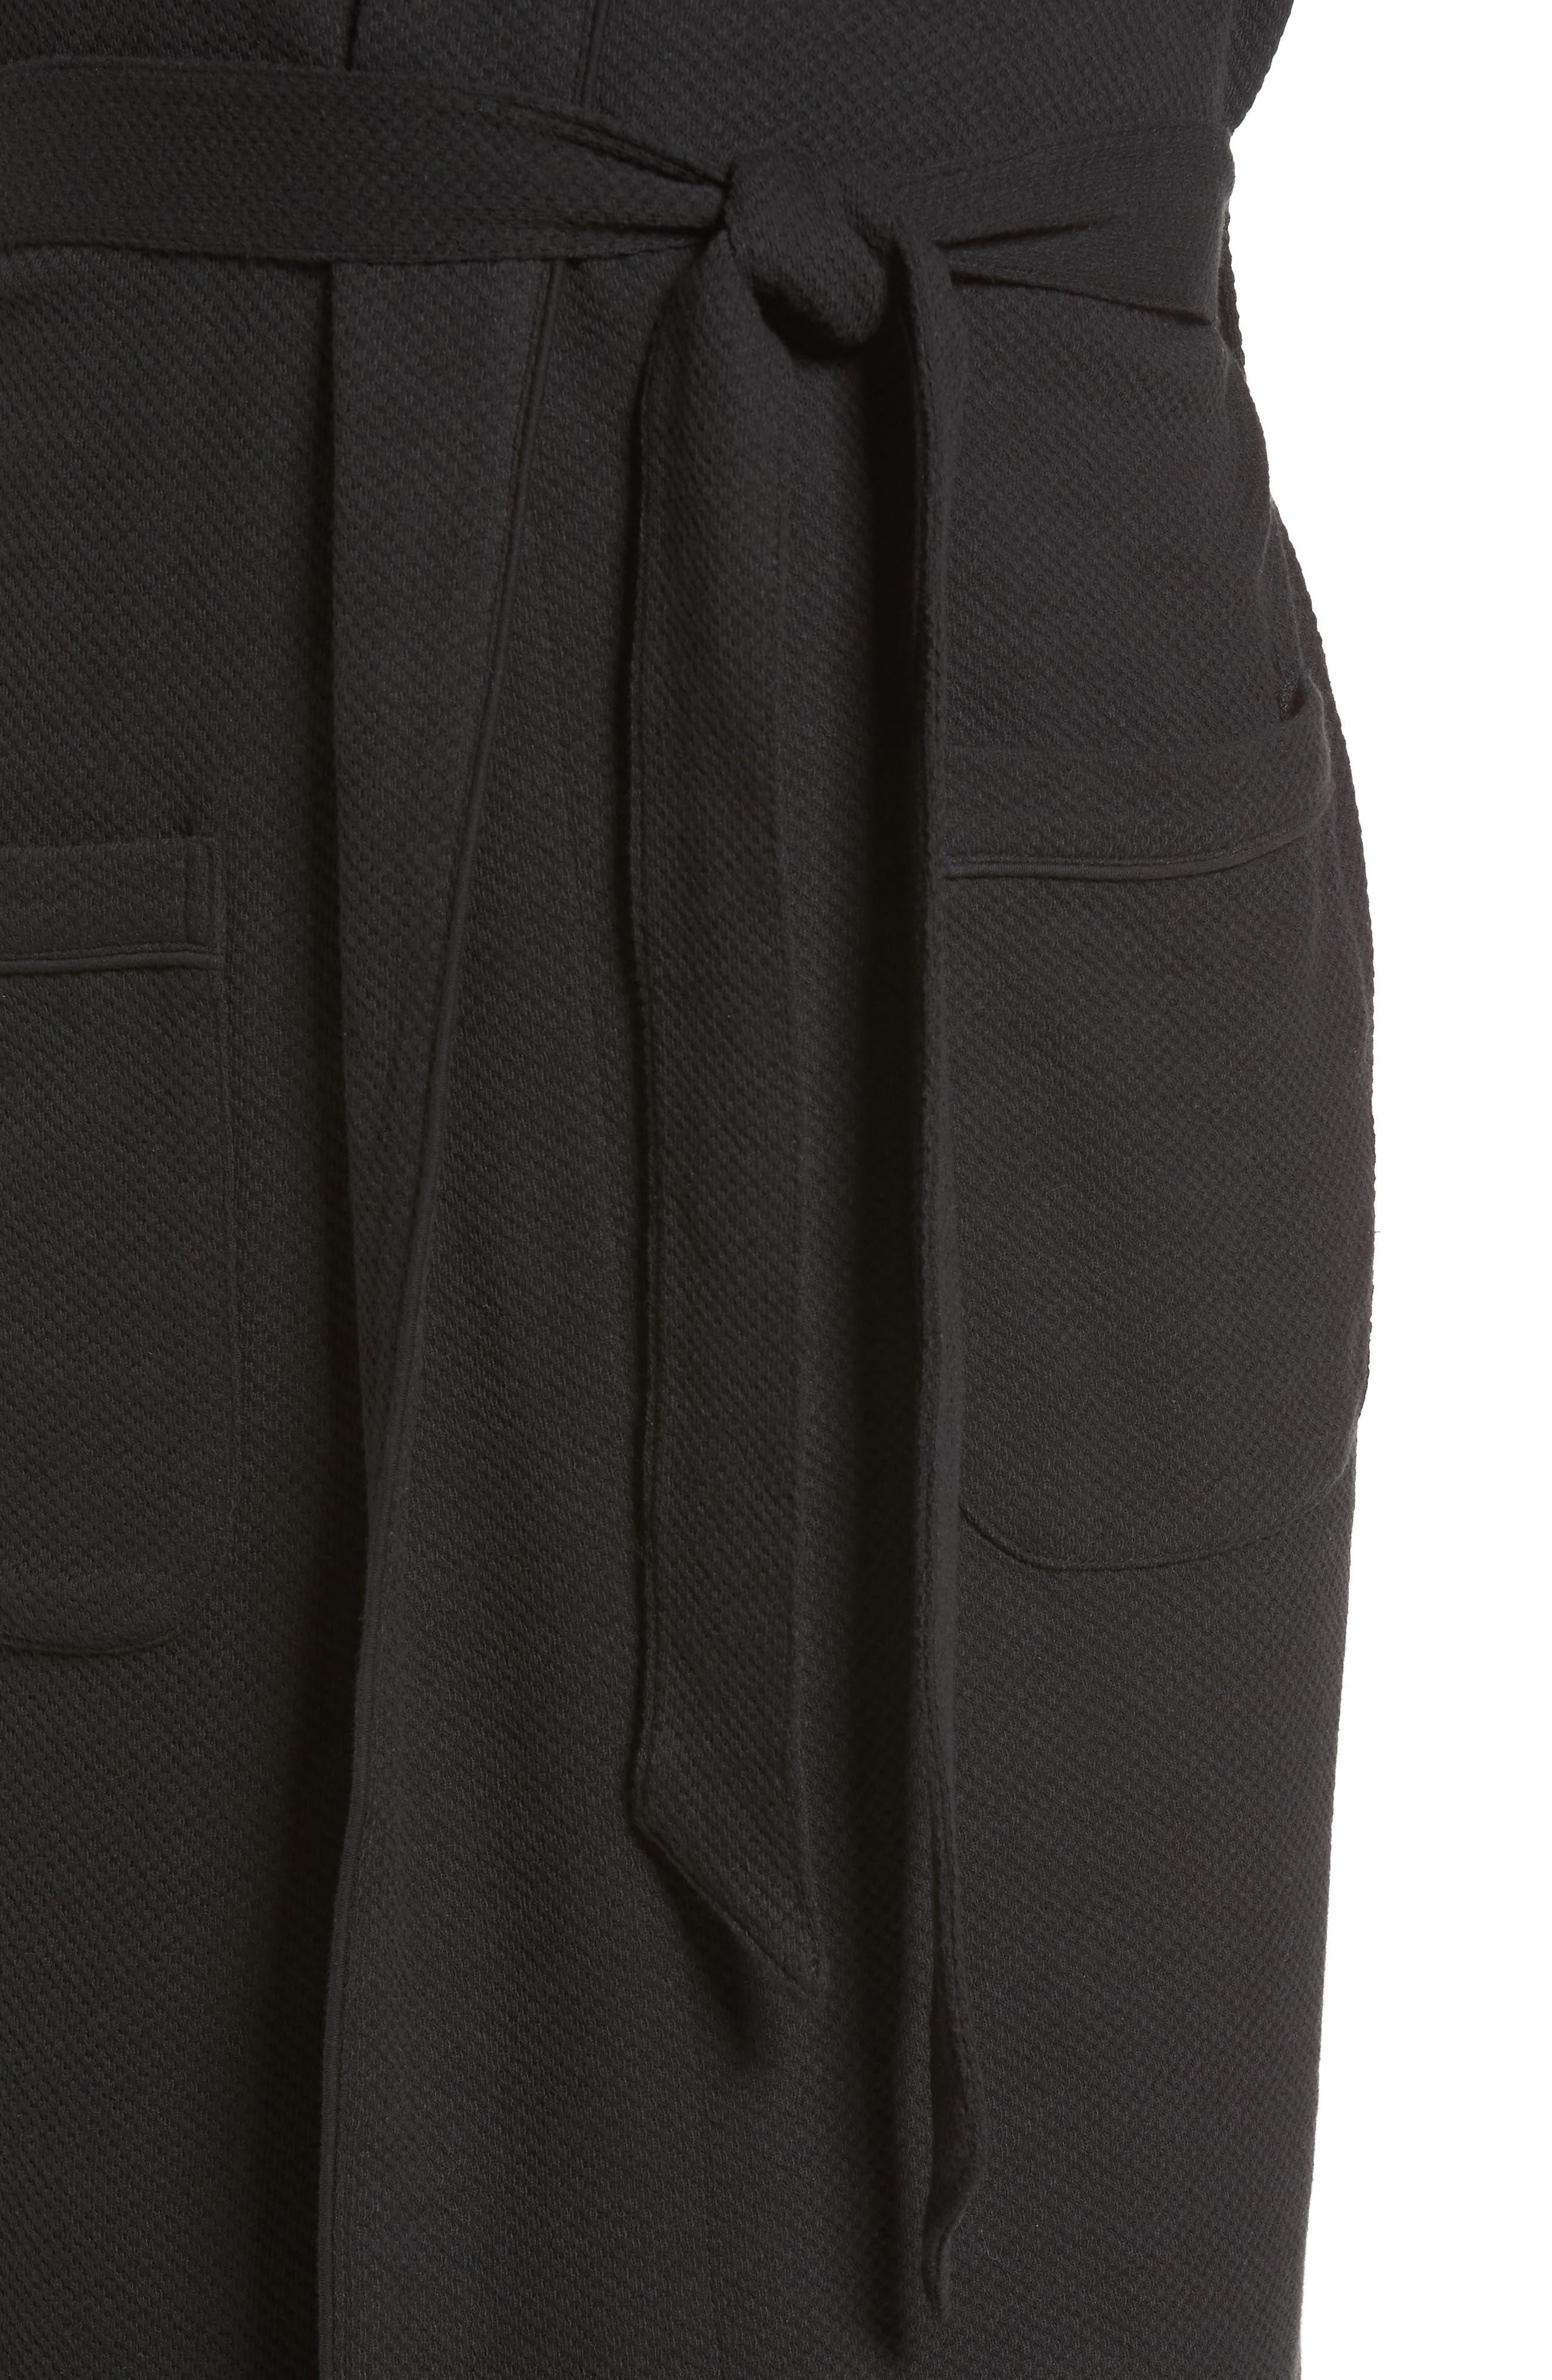 Thermal Robe,                             Alternate thumbnail 4, color,                             BLACK